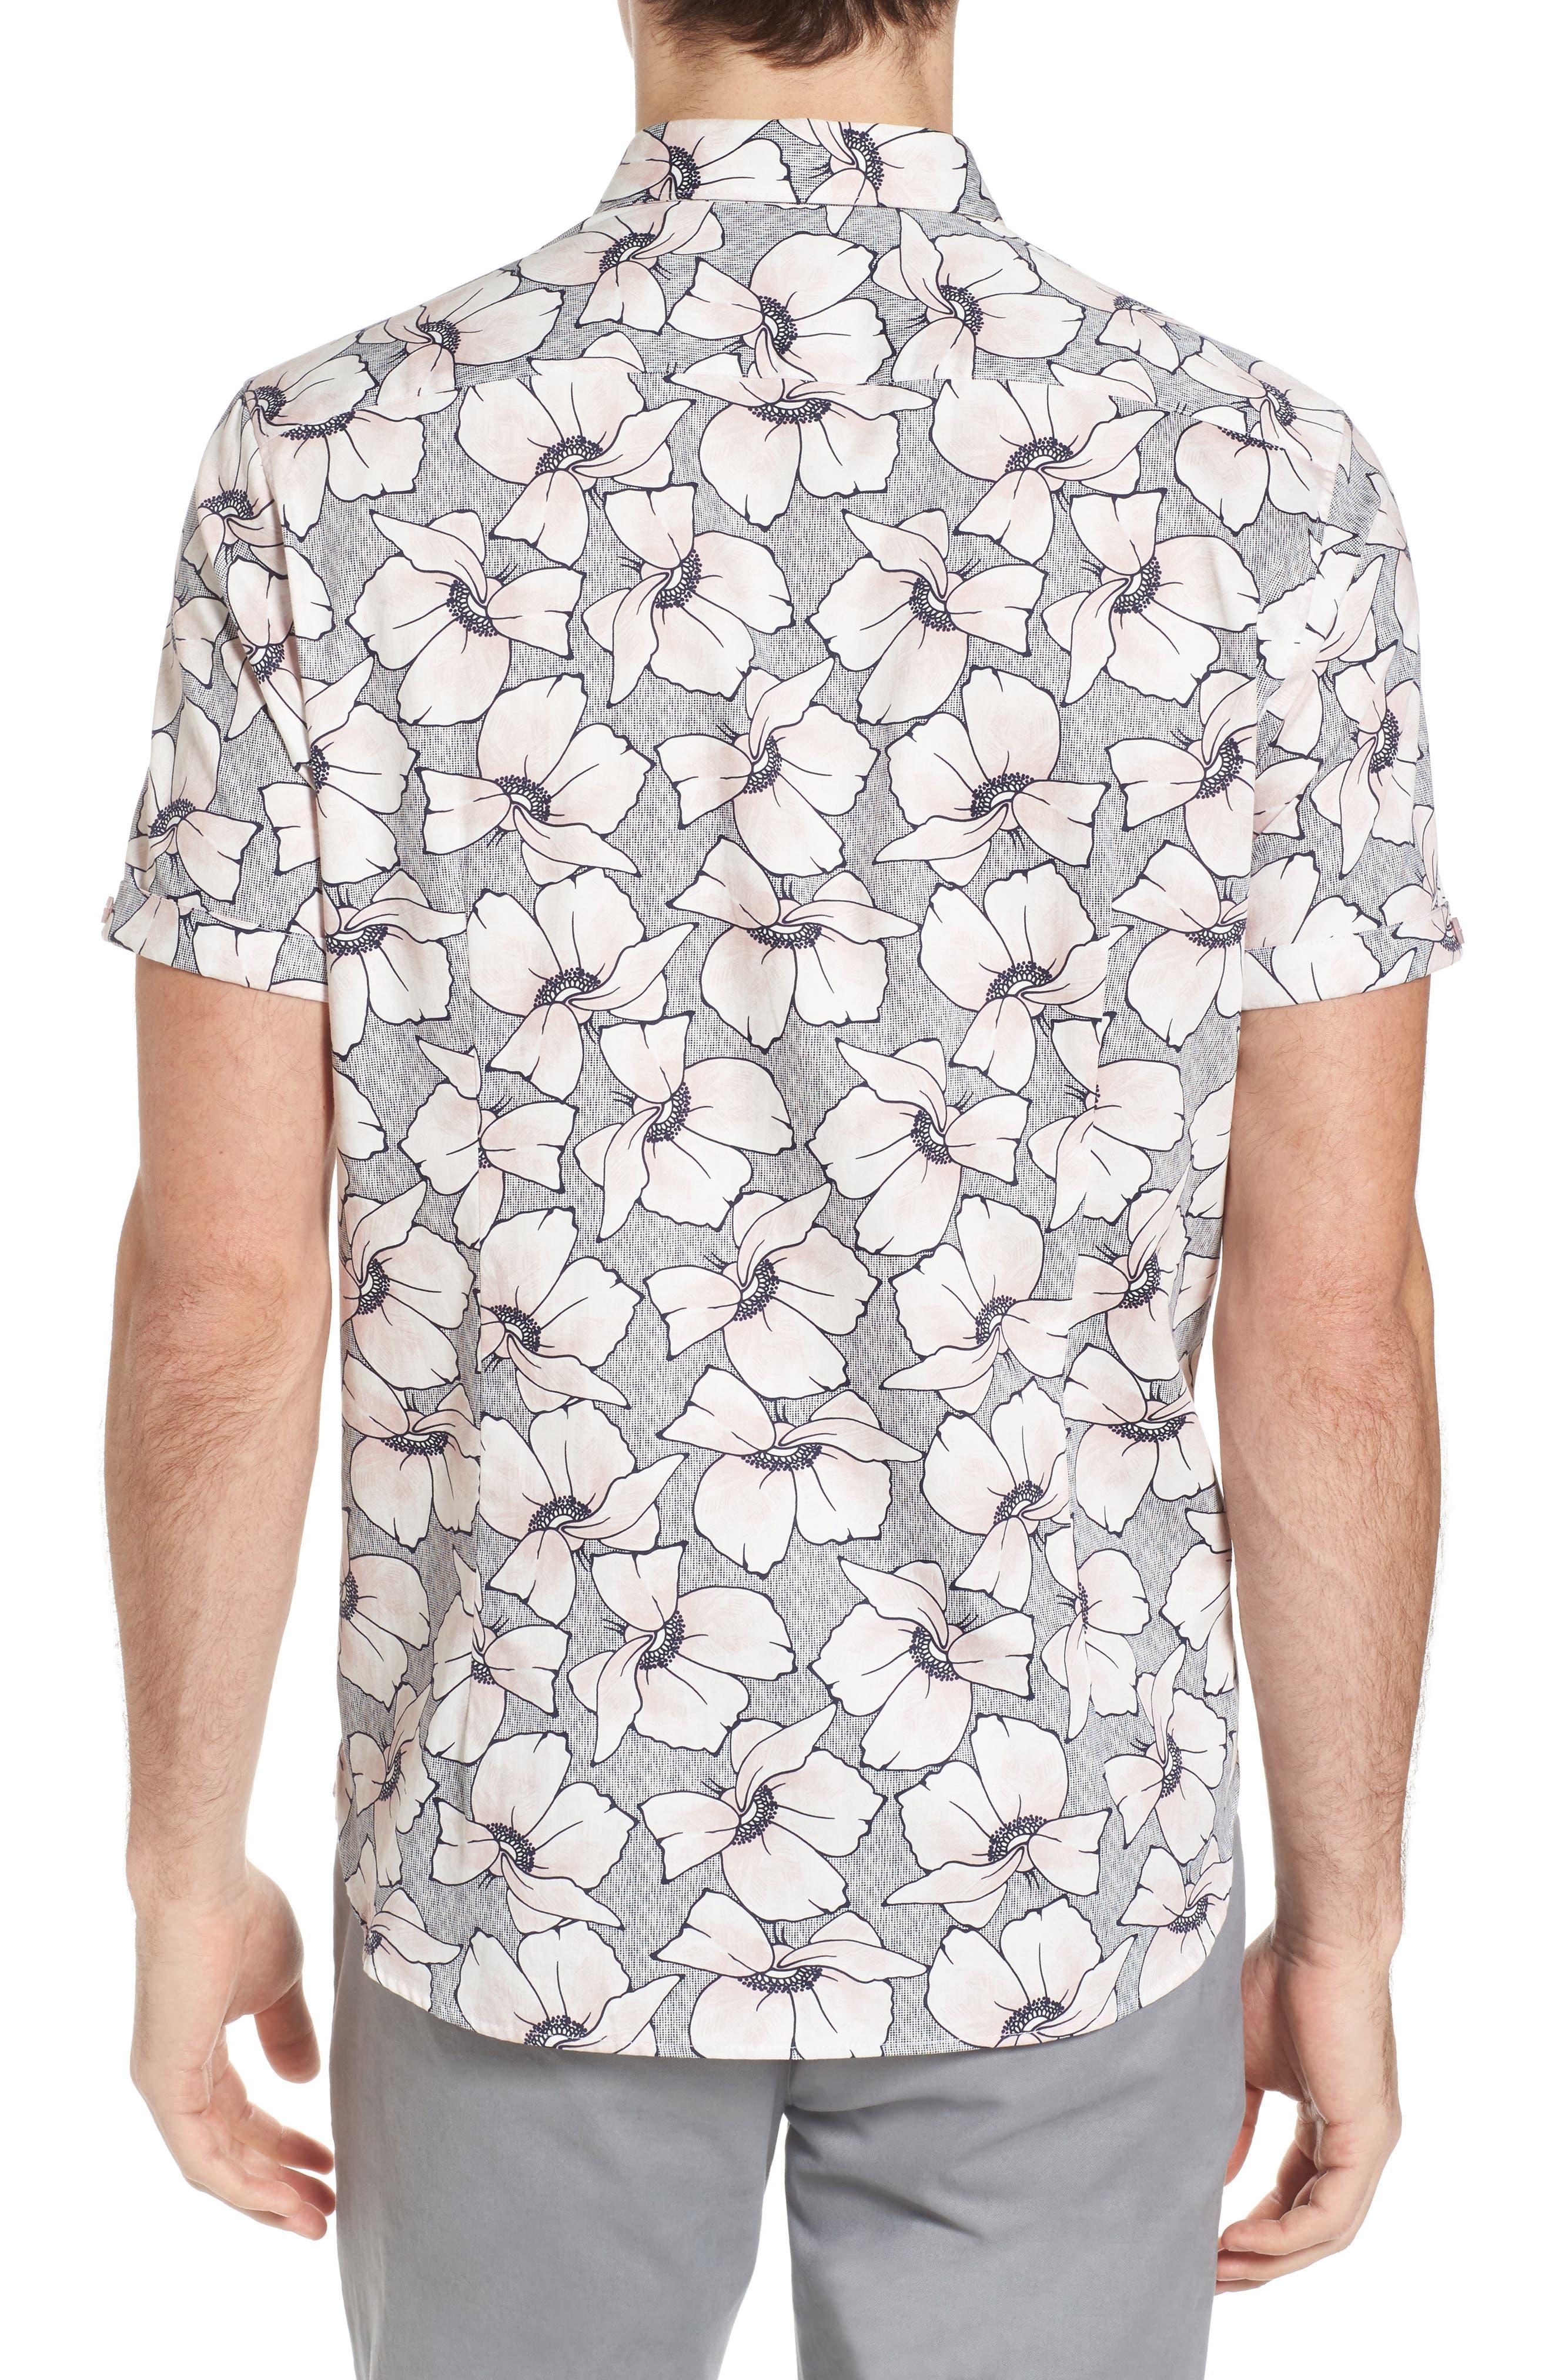 TED BAKER LONDON,                             Bigflo Floral Short Sleeve Sport Shirt,                             Alternate thumbnail 2, color,                             683